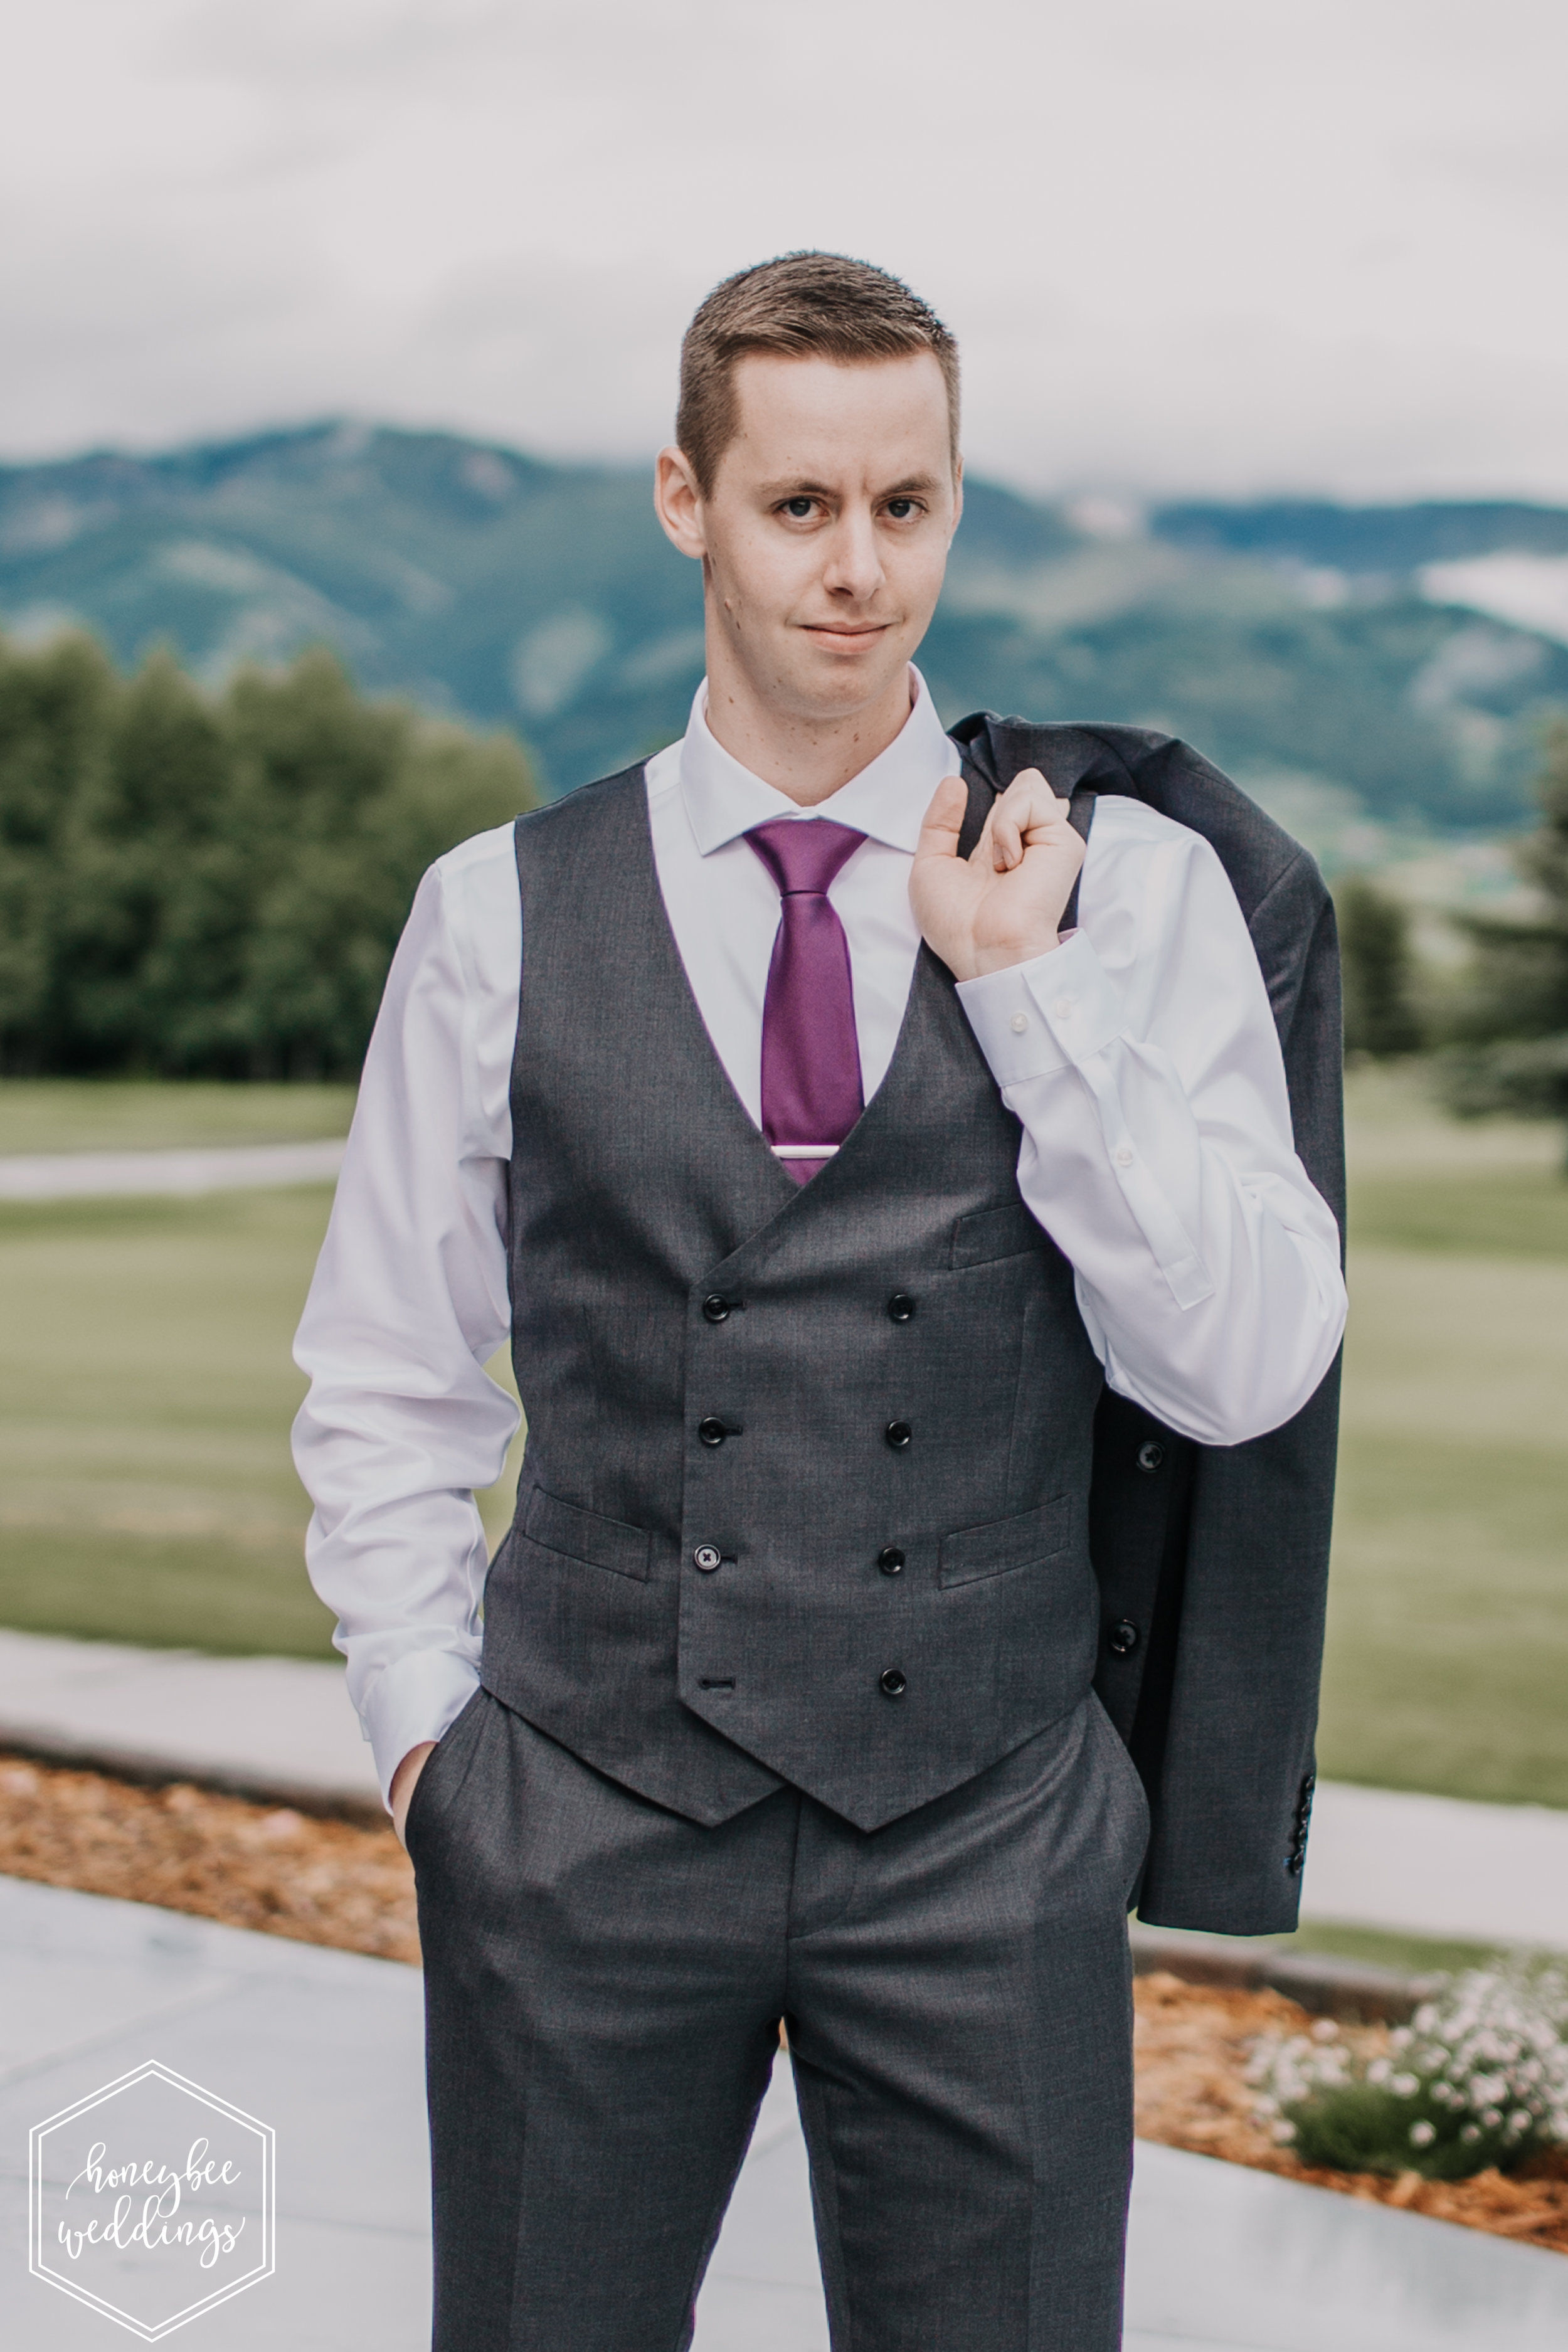 243 Riverside Country Club Wedding_Montana Wedding Photographer_Lauren Jackson + Evan Ivaldi 2018-7667.jpg